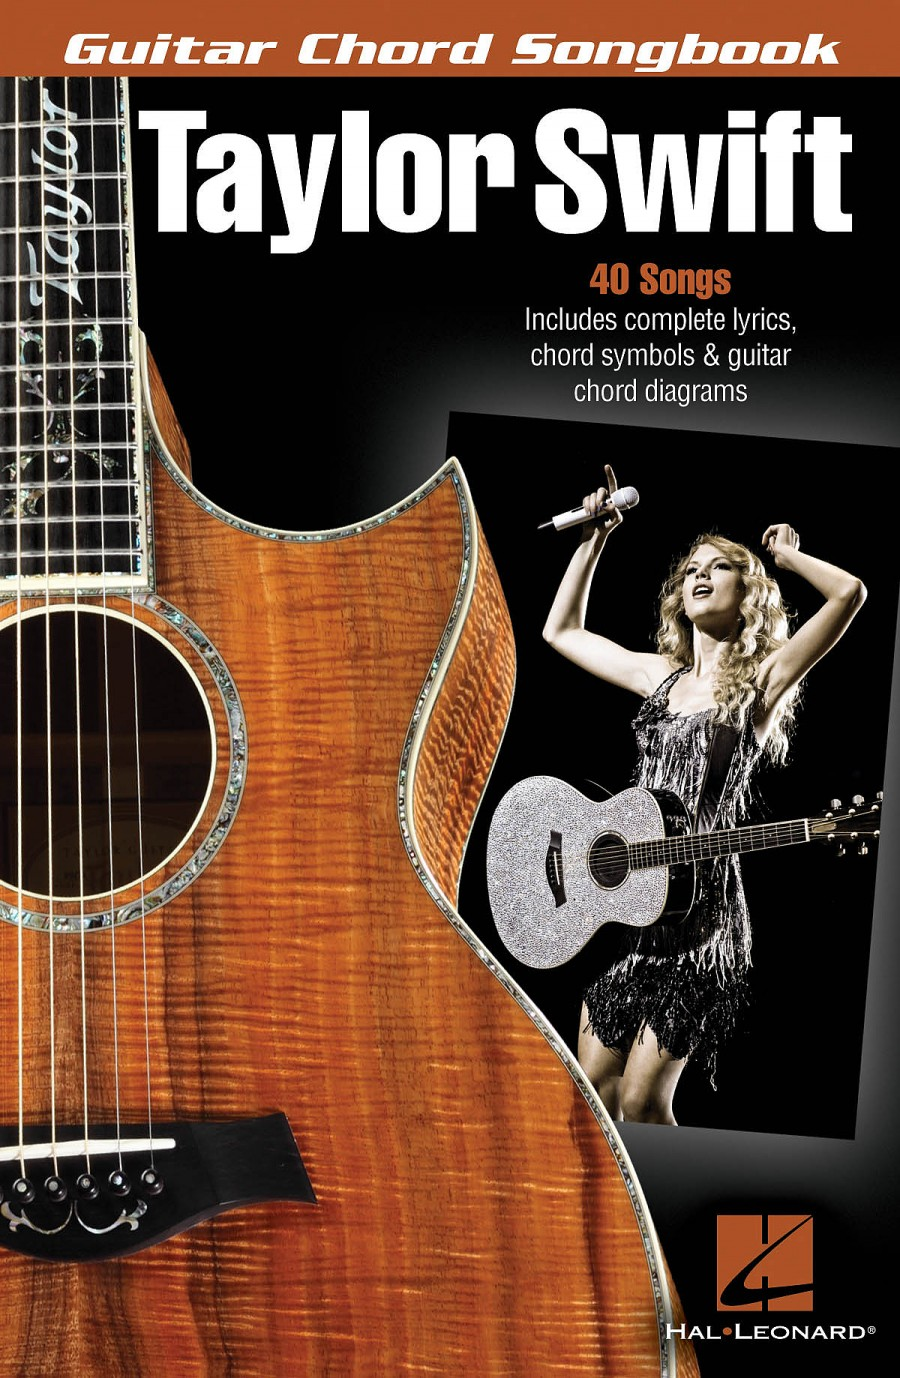 Taylor Swift Guitar Chord Songbook Presto Sheet Music